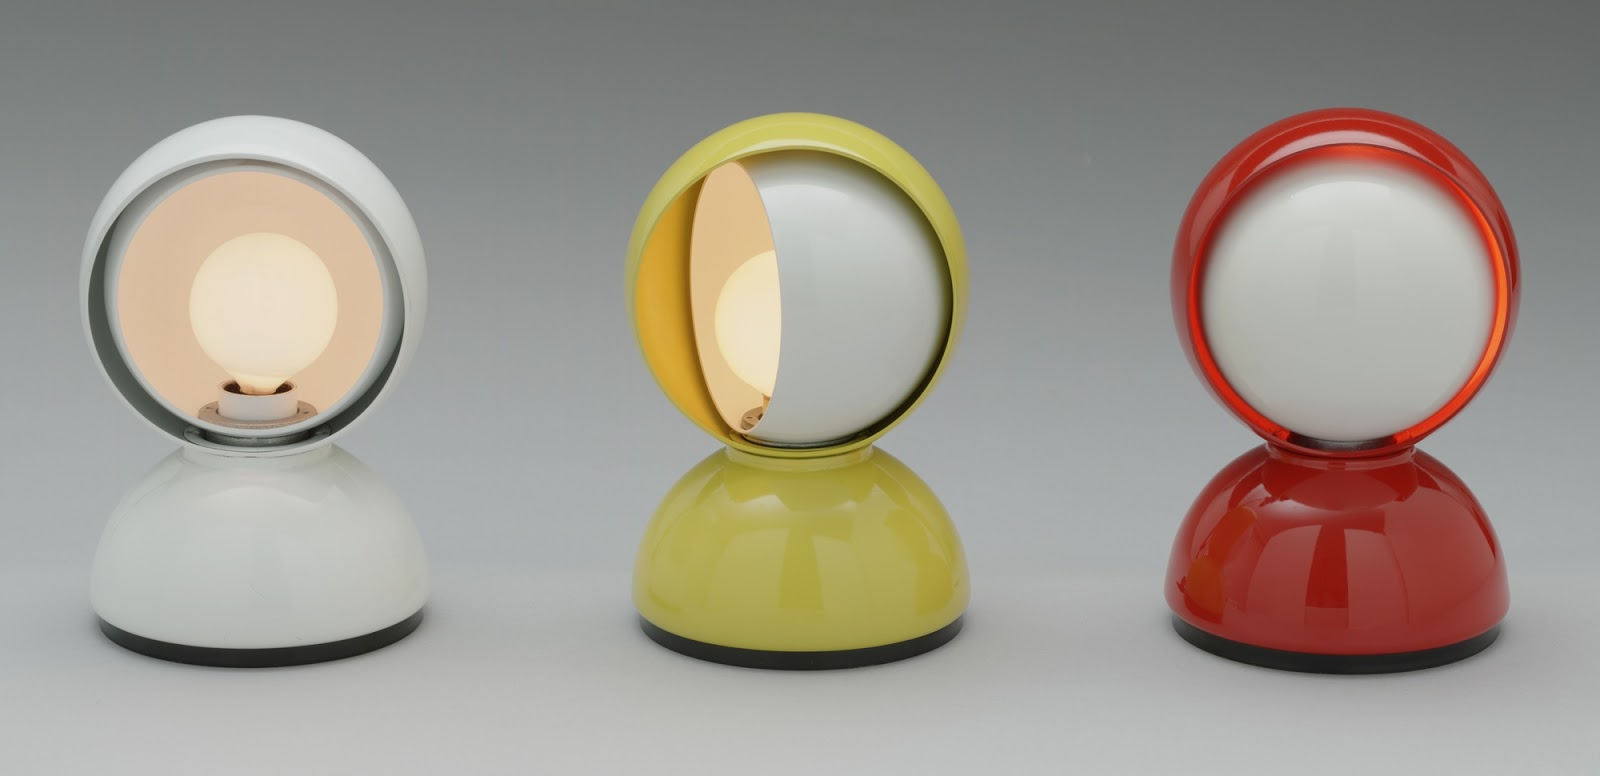 https://cafelab.blogspot.com/2018/03/icone-del-design-eclisse-di-artemide.html